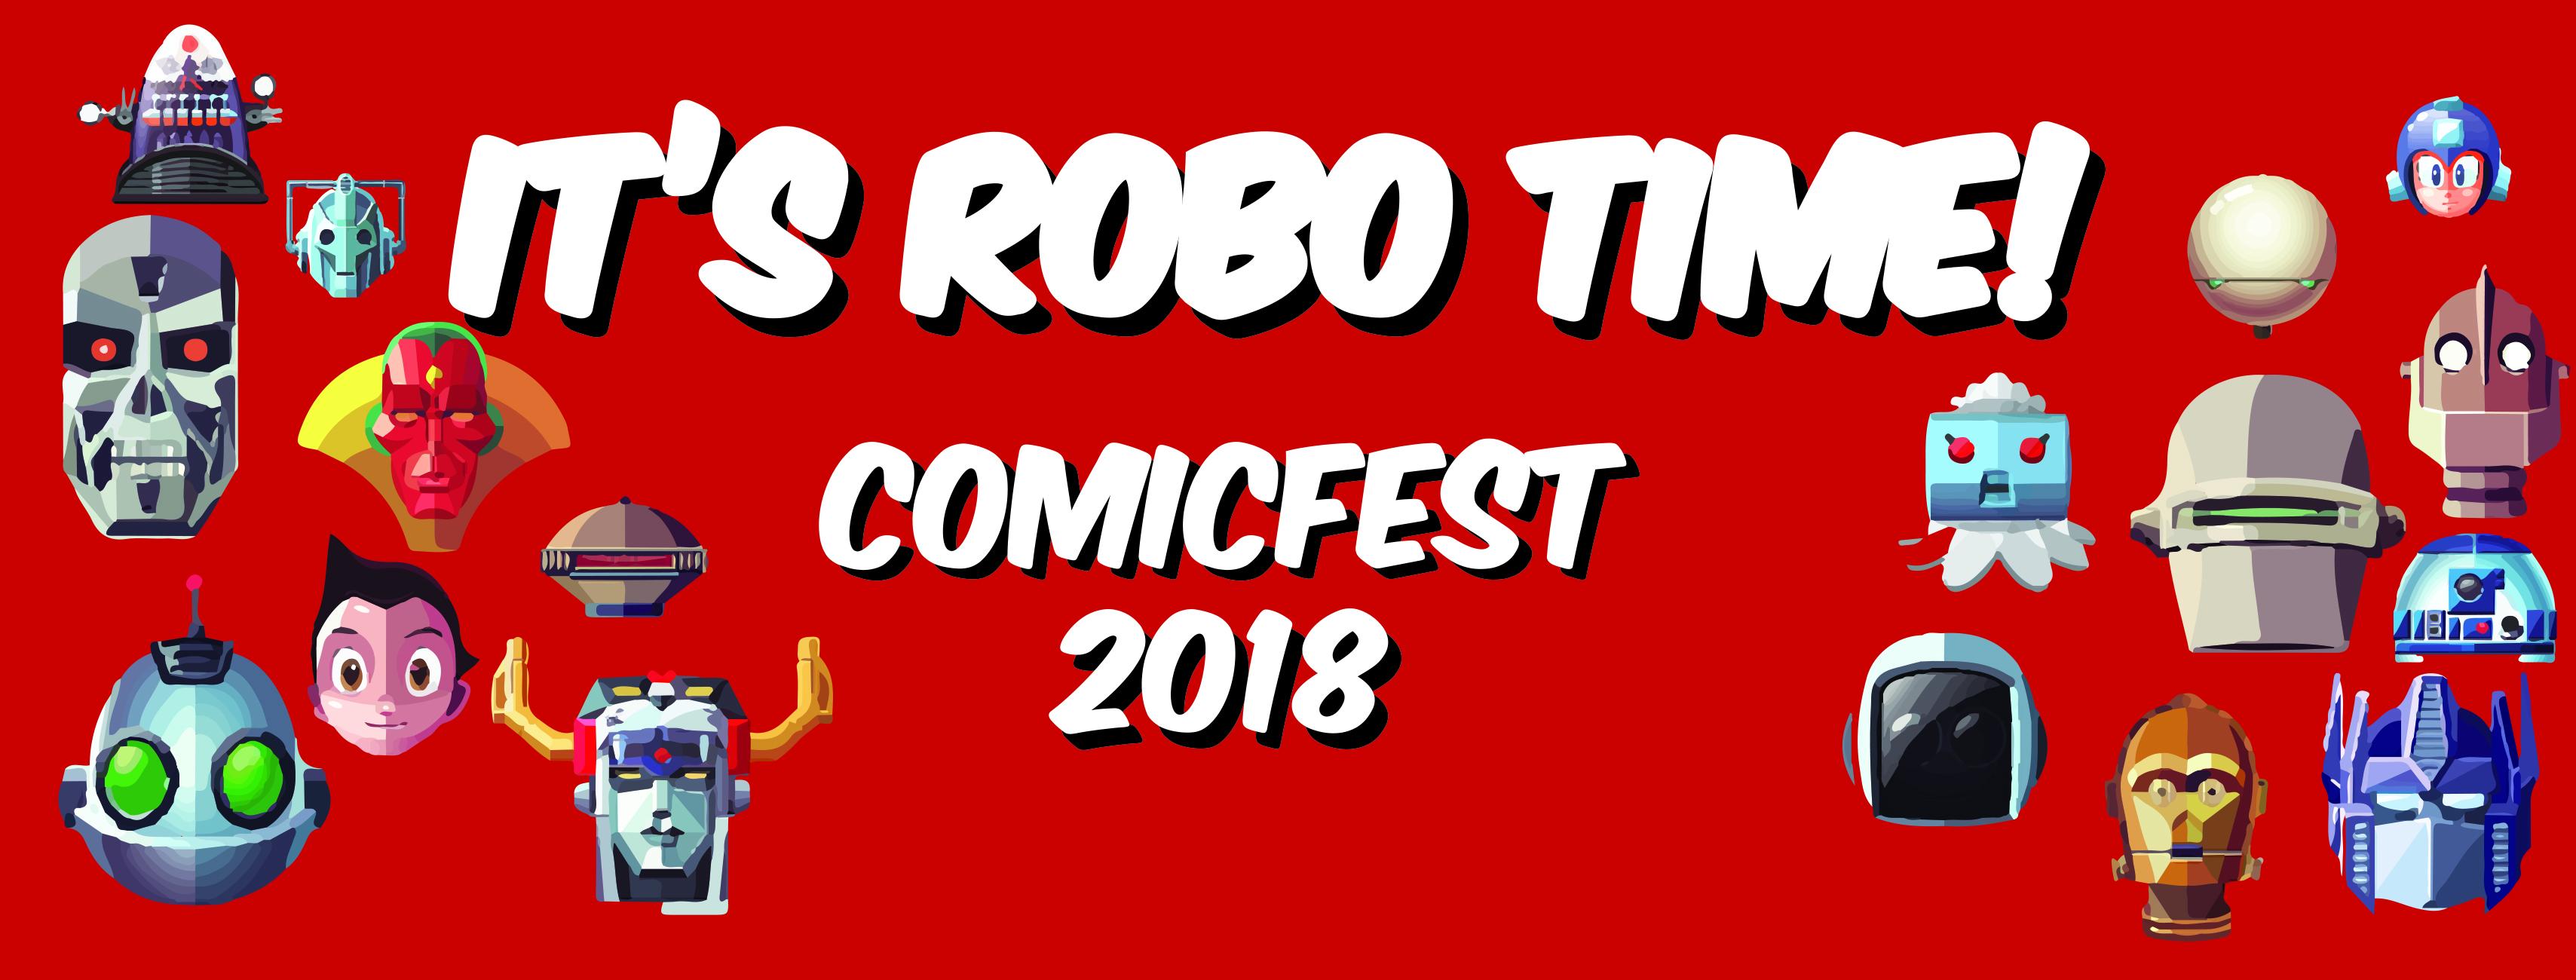 ComicFest Robo Theme